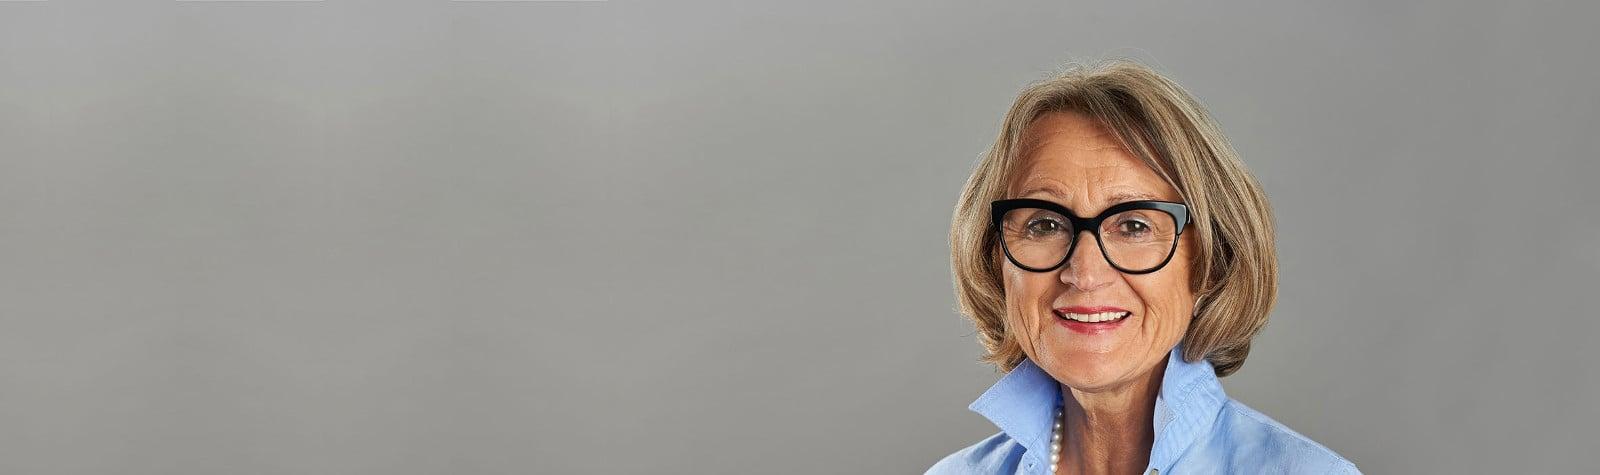 Übergang in den Ruhestand planen